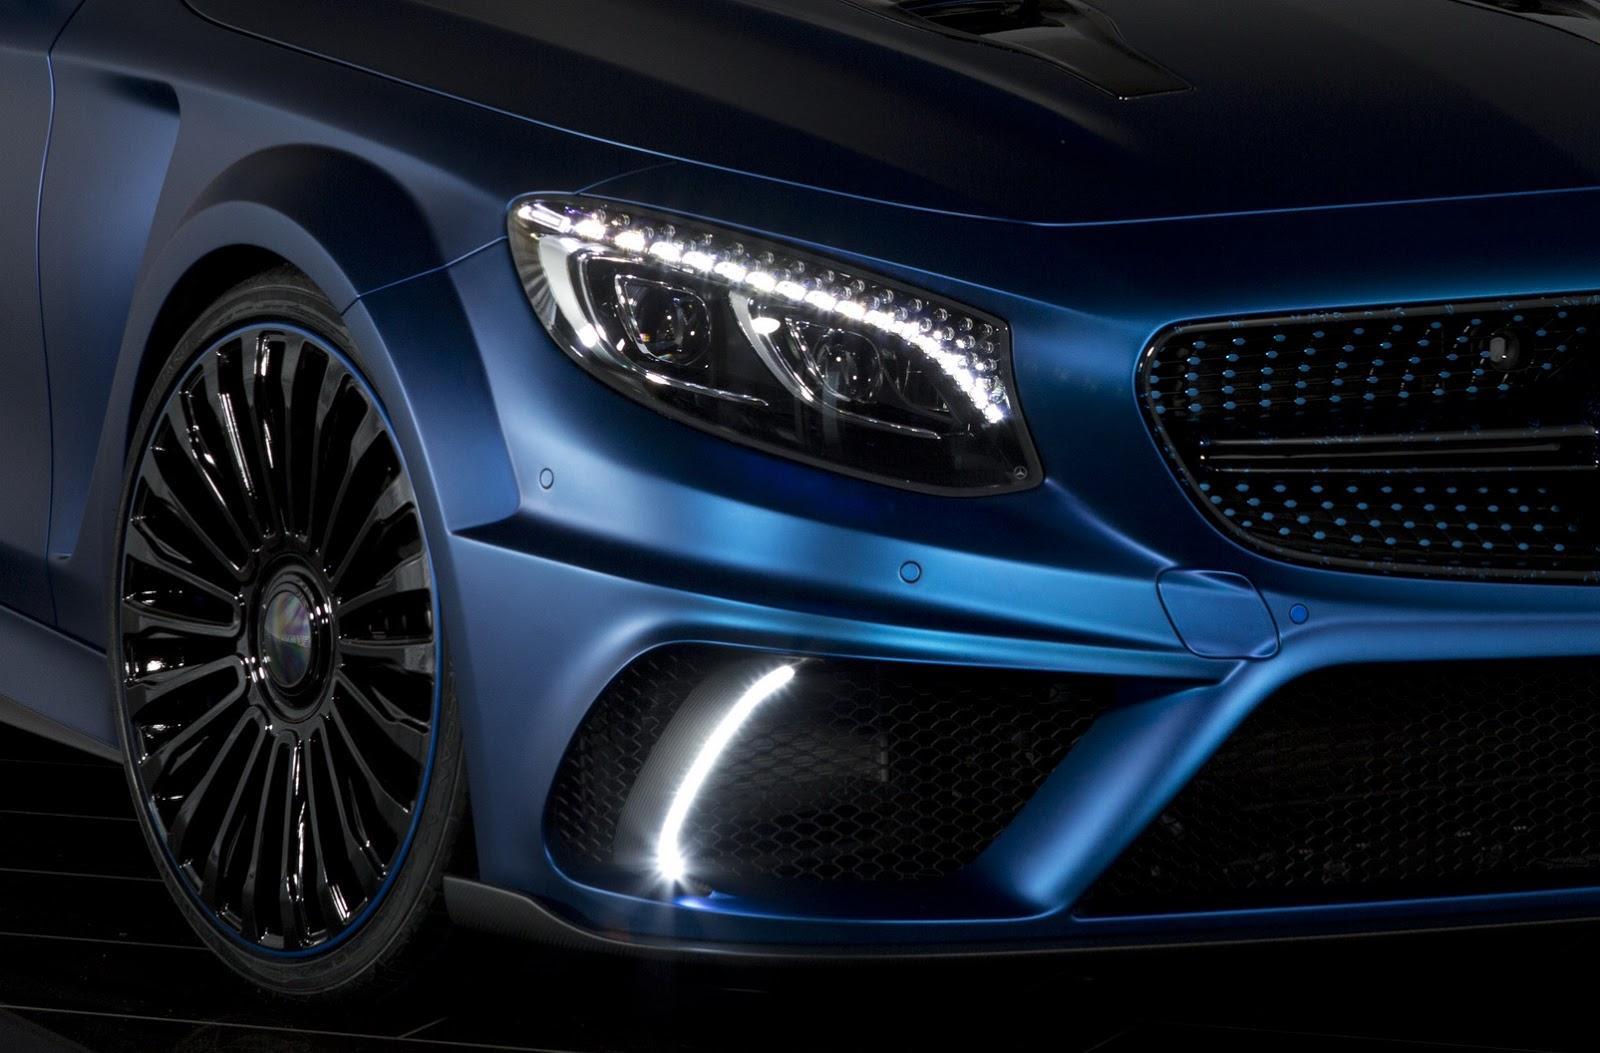 Paul Walker Blue Car Wallpaper Mansory S Mercedes S63 Amg Coup 233 Diamond Edition Has More